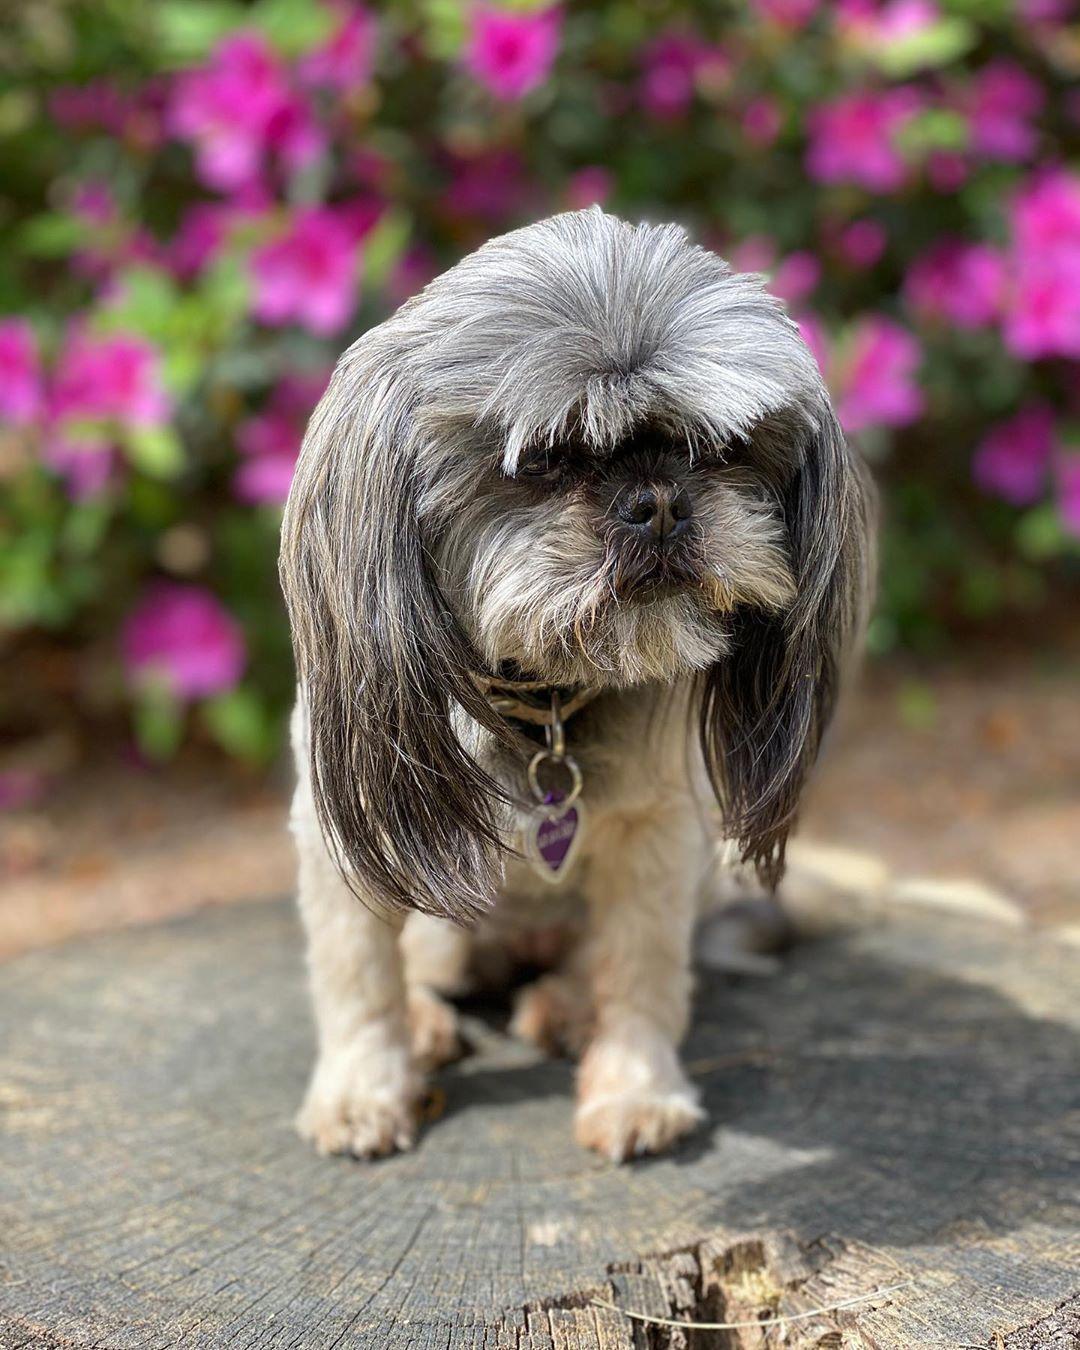 Take Time To Smell The Roses You Wont Regret It Dogslife Shihtzu Dog Loyal Mansbestfriend Imperialshihtzu Dangerous Dogs Dog Breeds Dogs